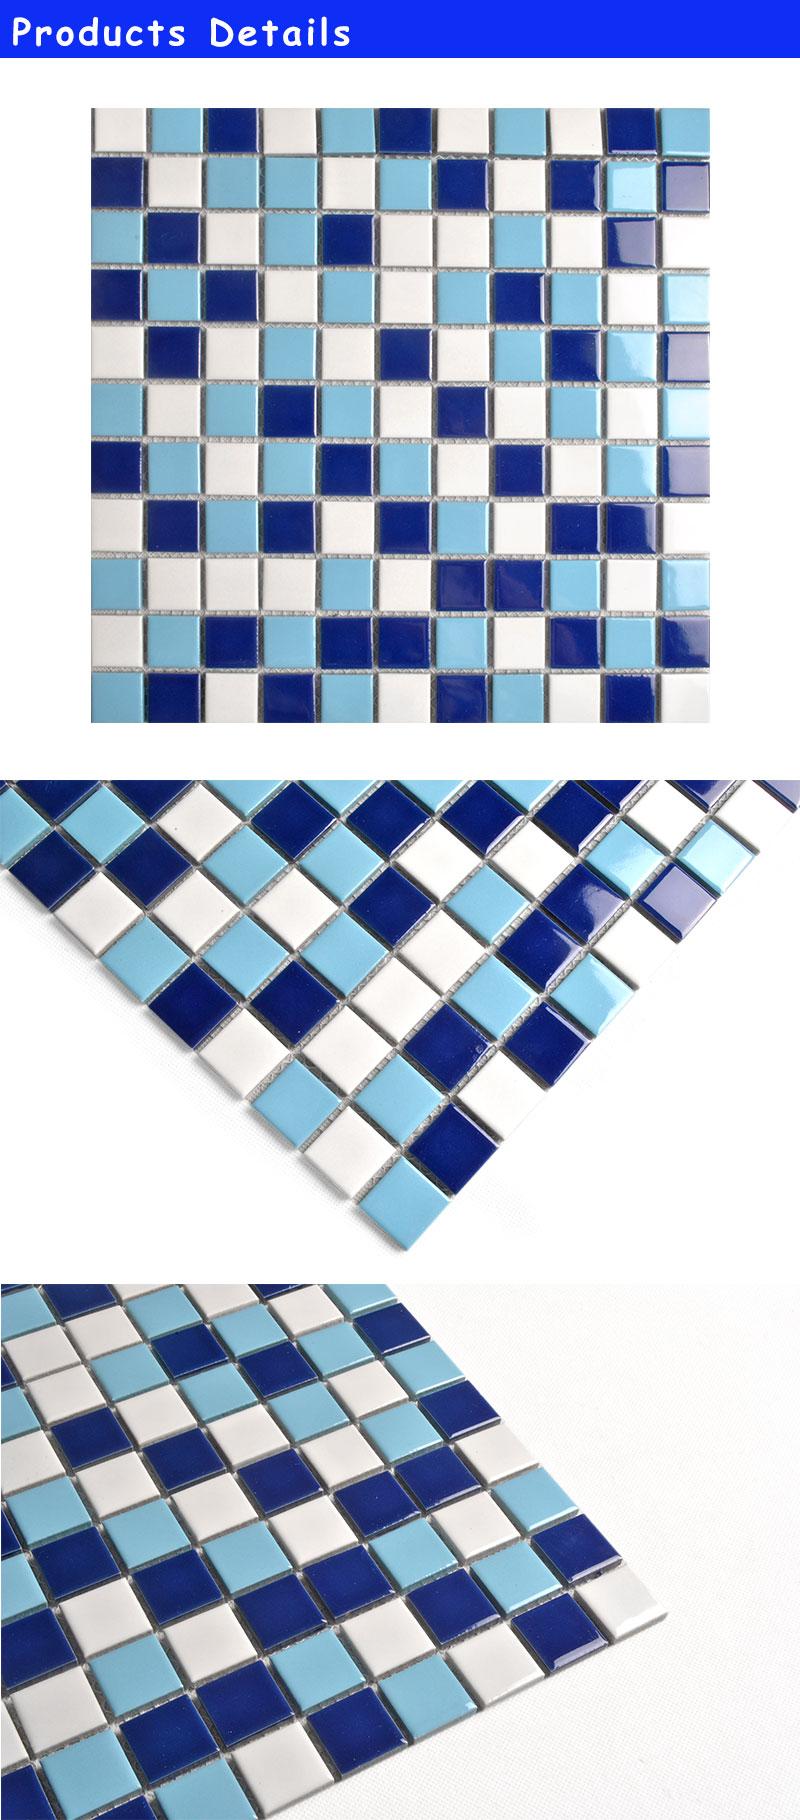 25x25 Wholesale Blue Ceramic Tile Japan Swimming Pool Tile - Buy ...